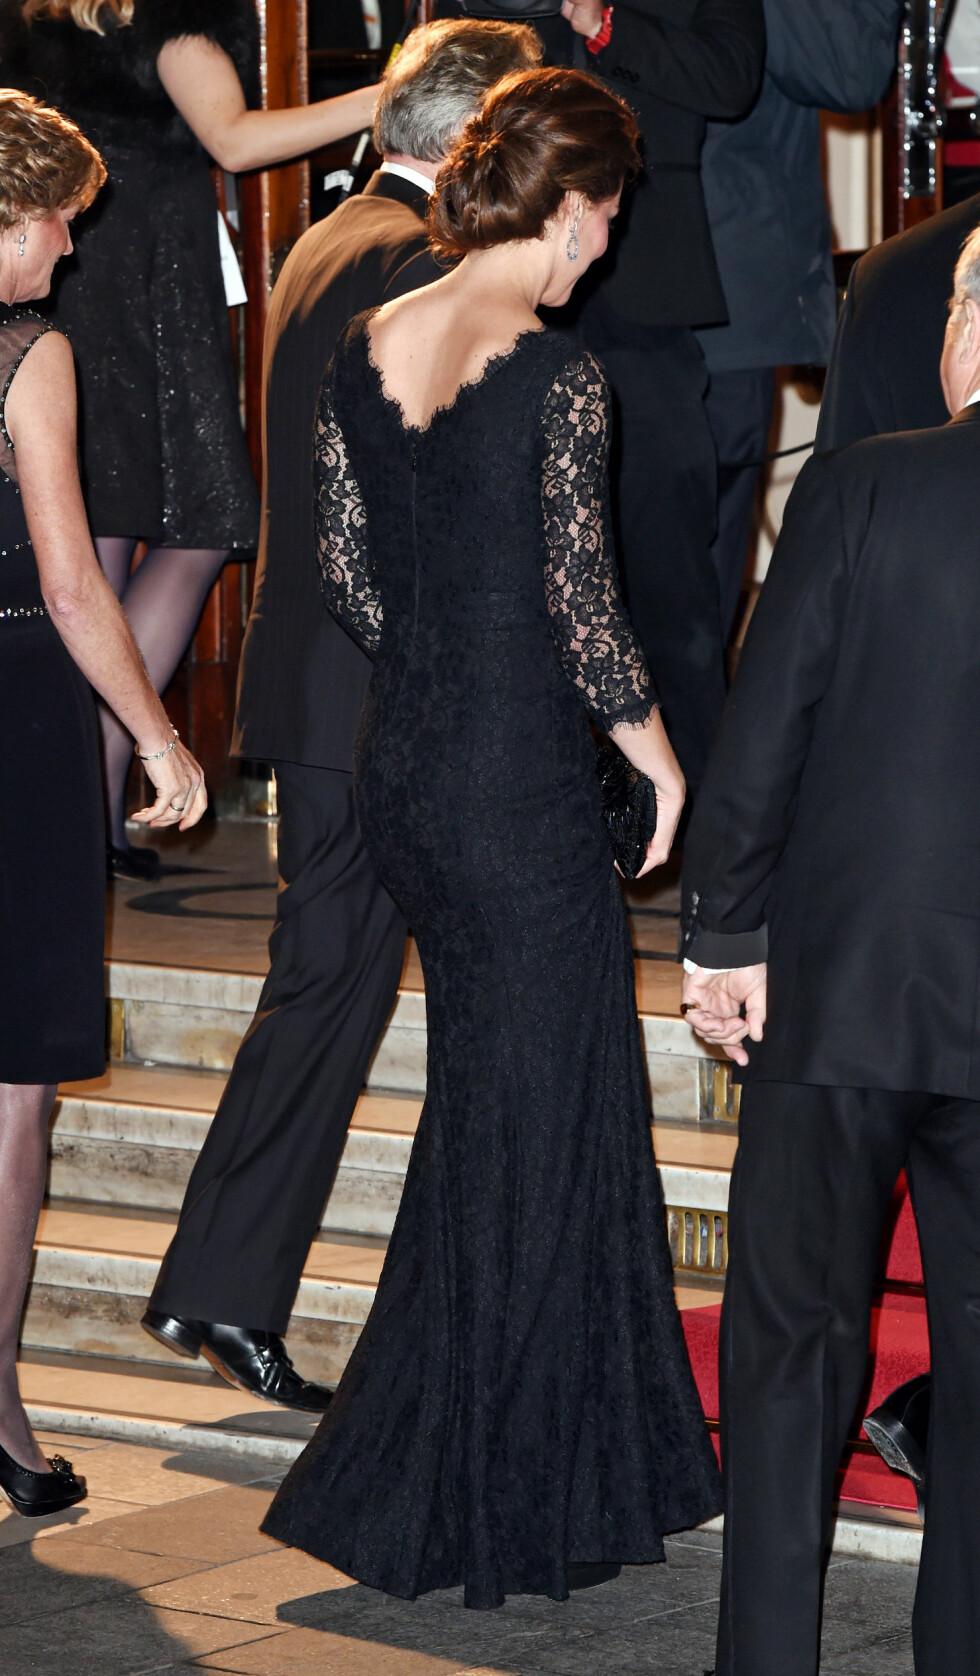 TILDEKKET FORAN - NYDELIG SKJÆRING BAK: Hertuginne Kate er helt nydelig i denne kjolen fra Diane von Furstenberg. Foto: REX/David Fisher/All Over Press